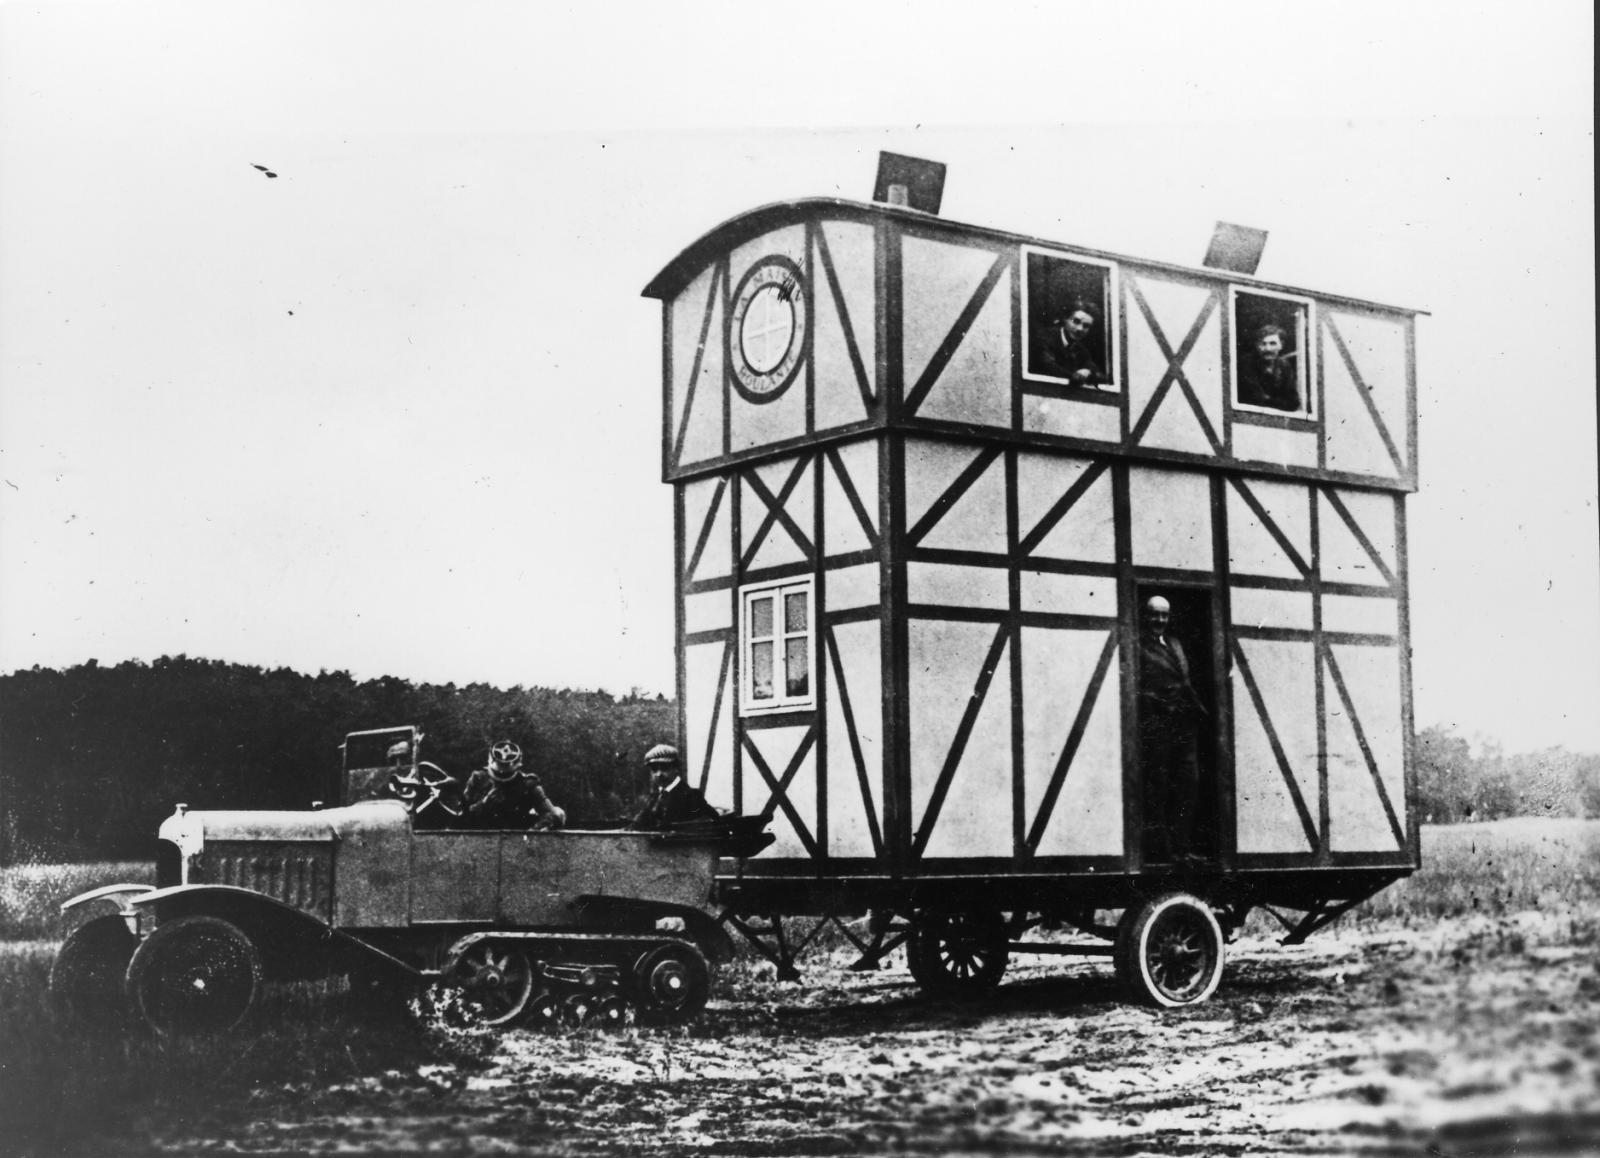 Type K1 - B2 mobile home